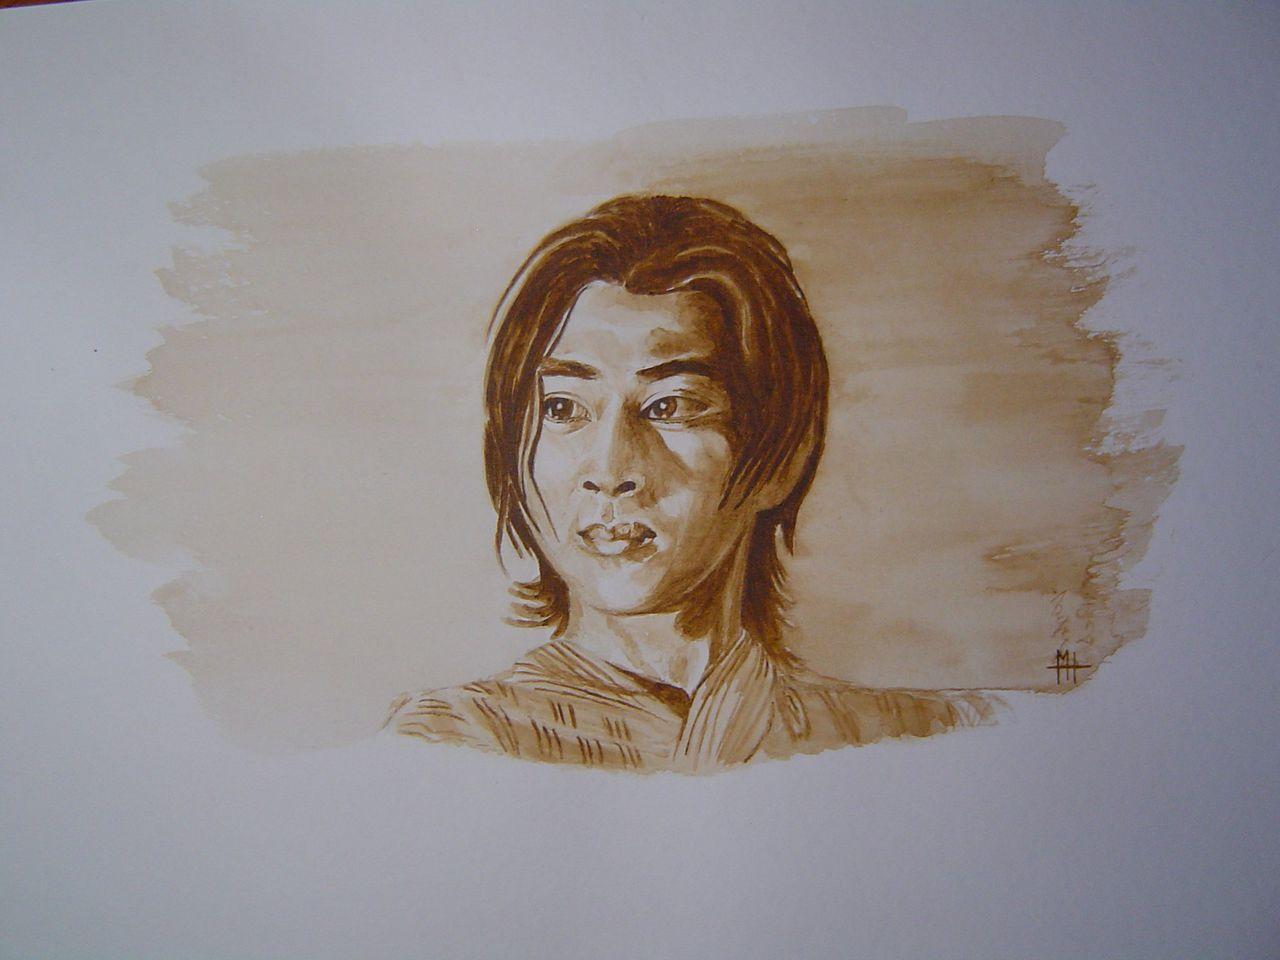 Marie-Hélène CLINCHAMPS Matsuda Shota